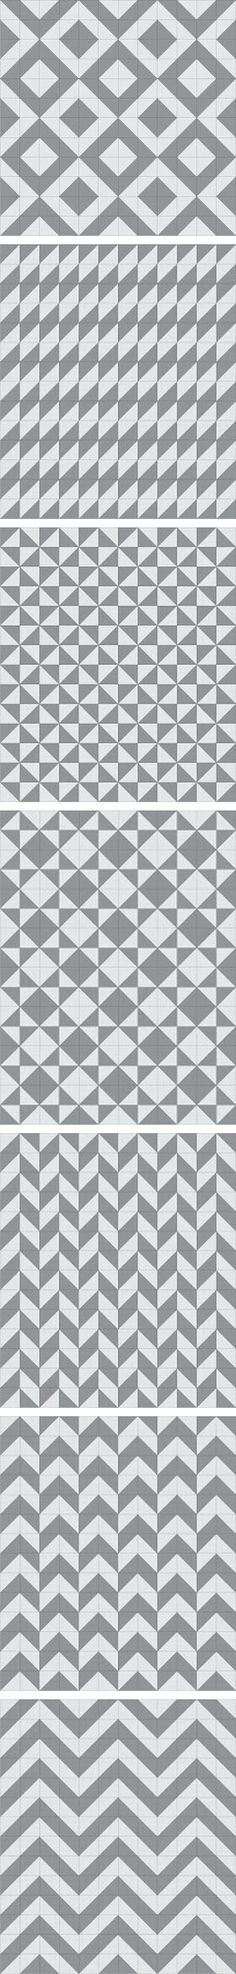 Half Square Triangle Arrangements